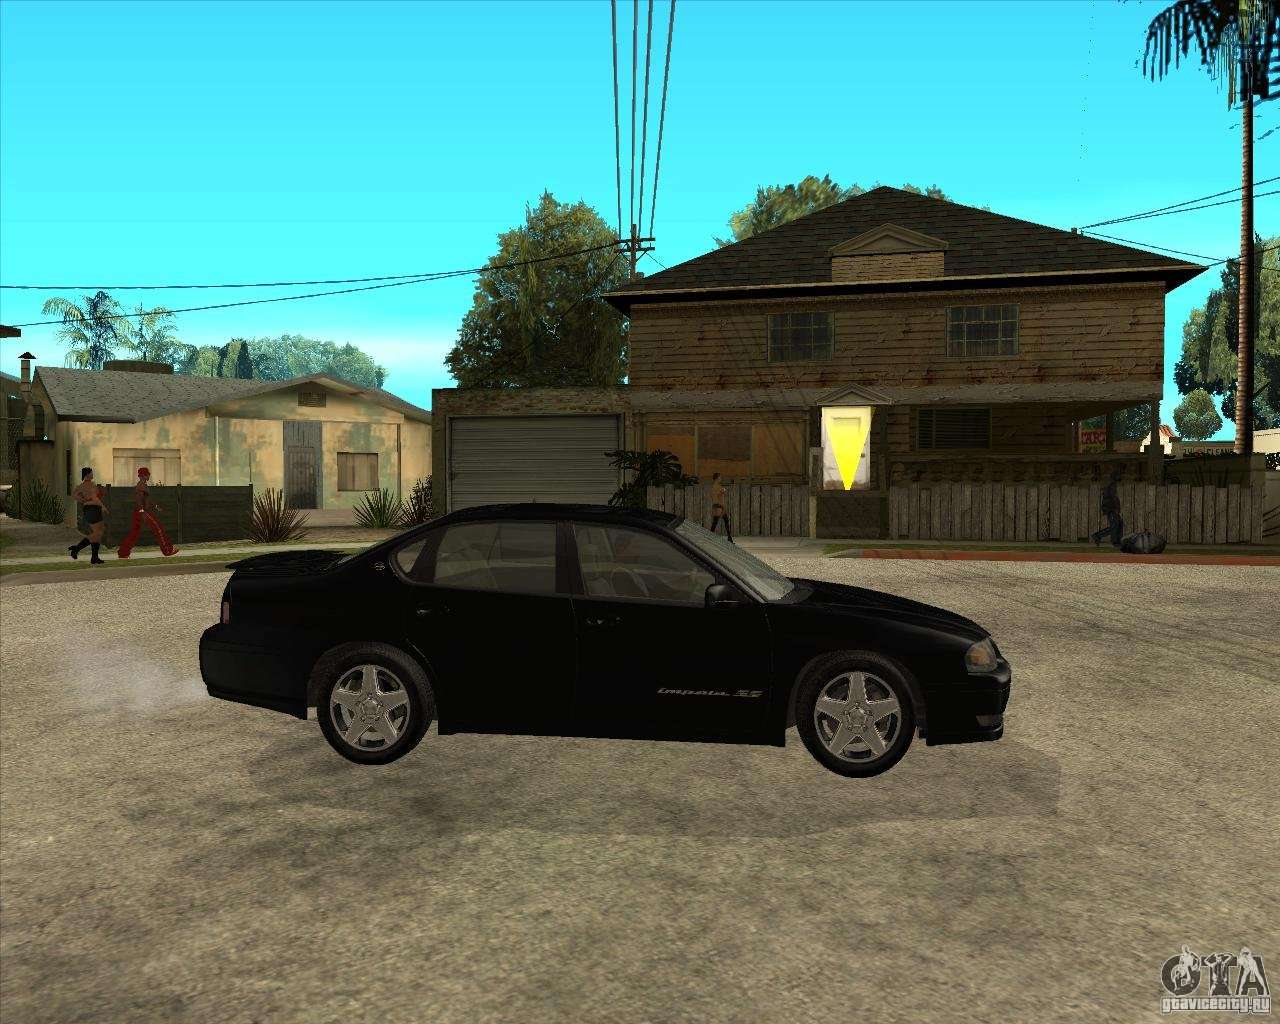 2003 Chevrolet Impala Overview  MSN Autos